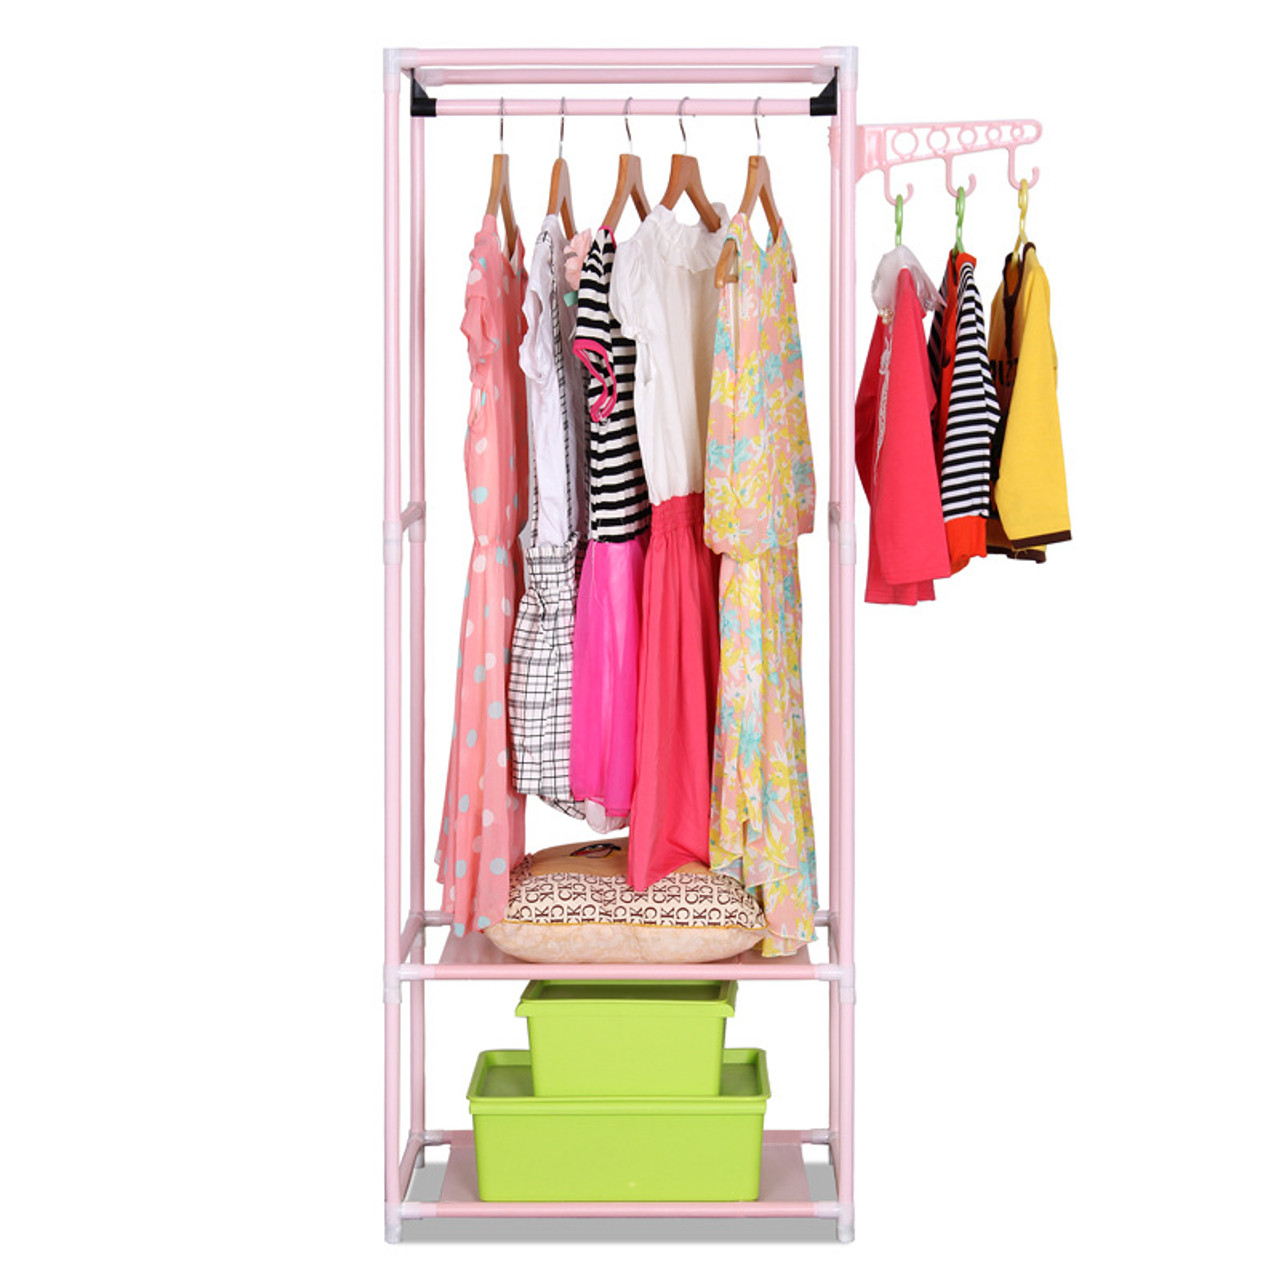 Costway Simple Clothes Coat Rack Bedroom Floor Hanging Clothes